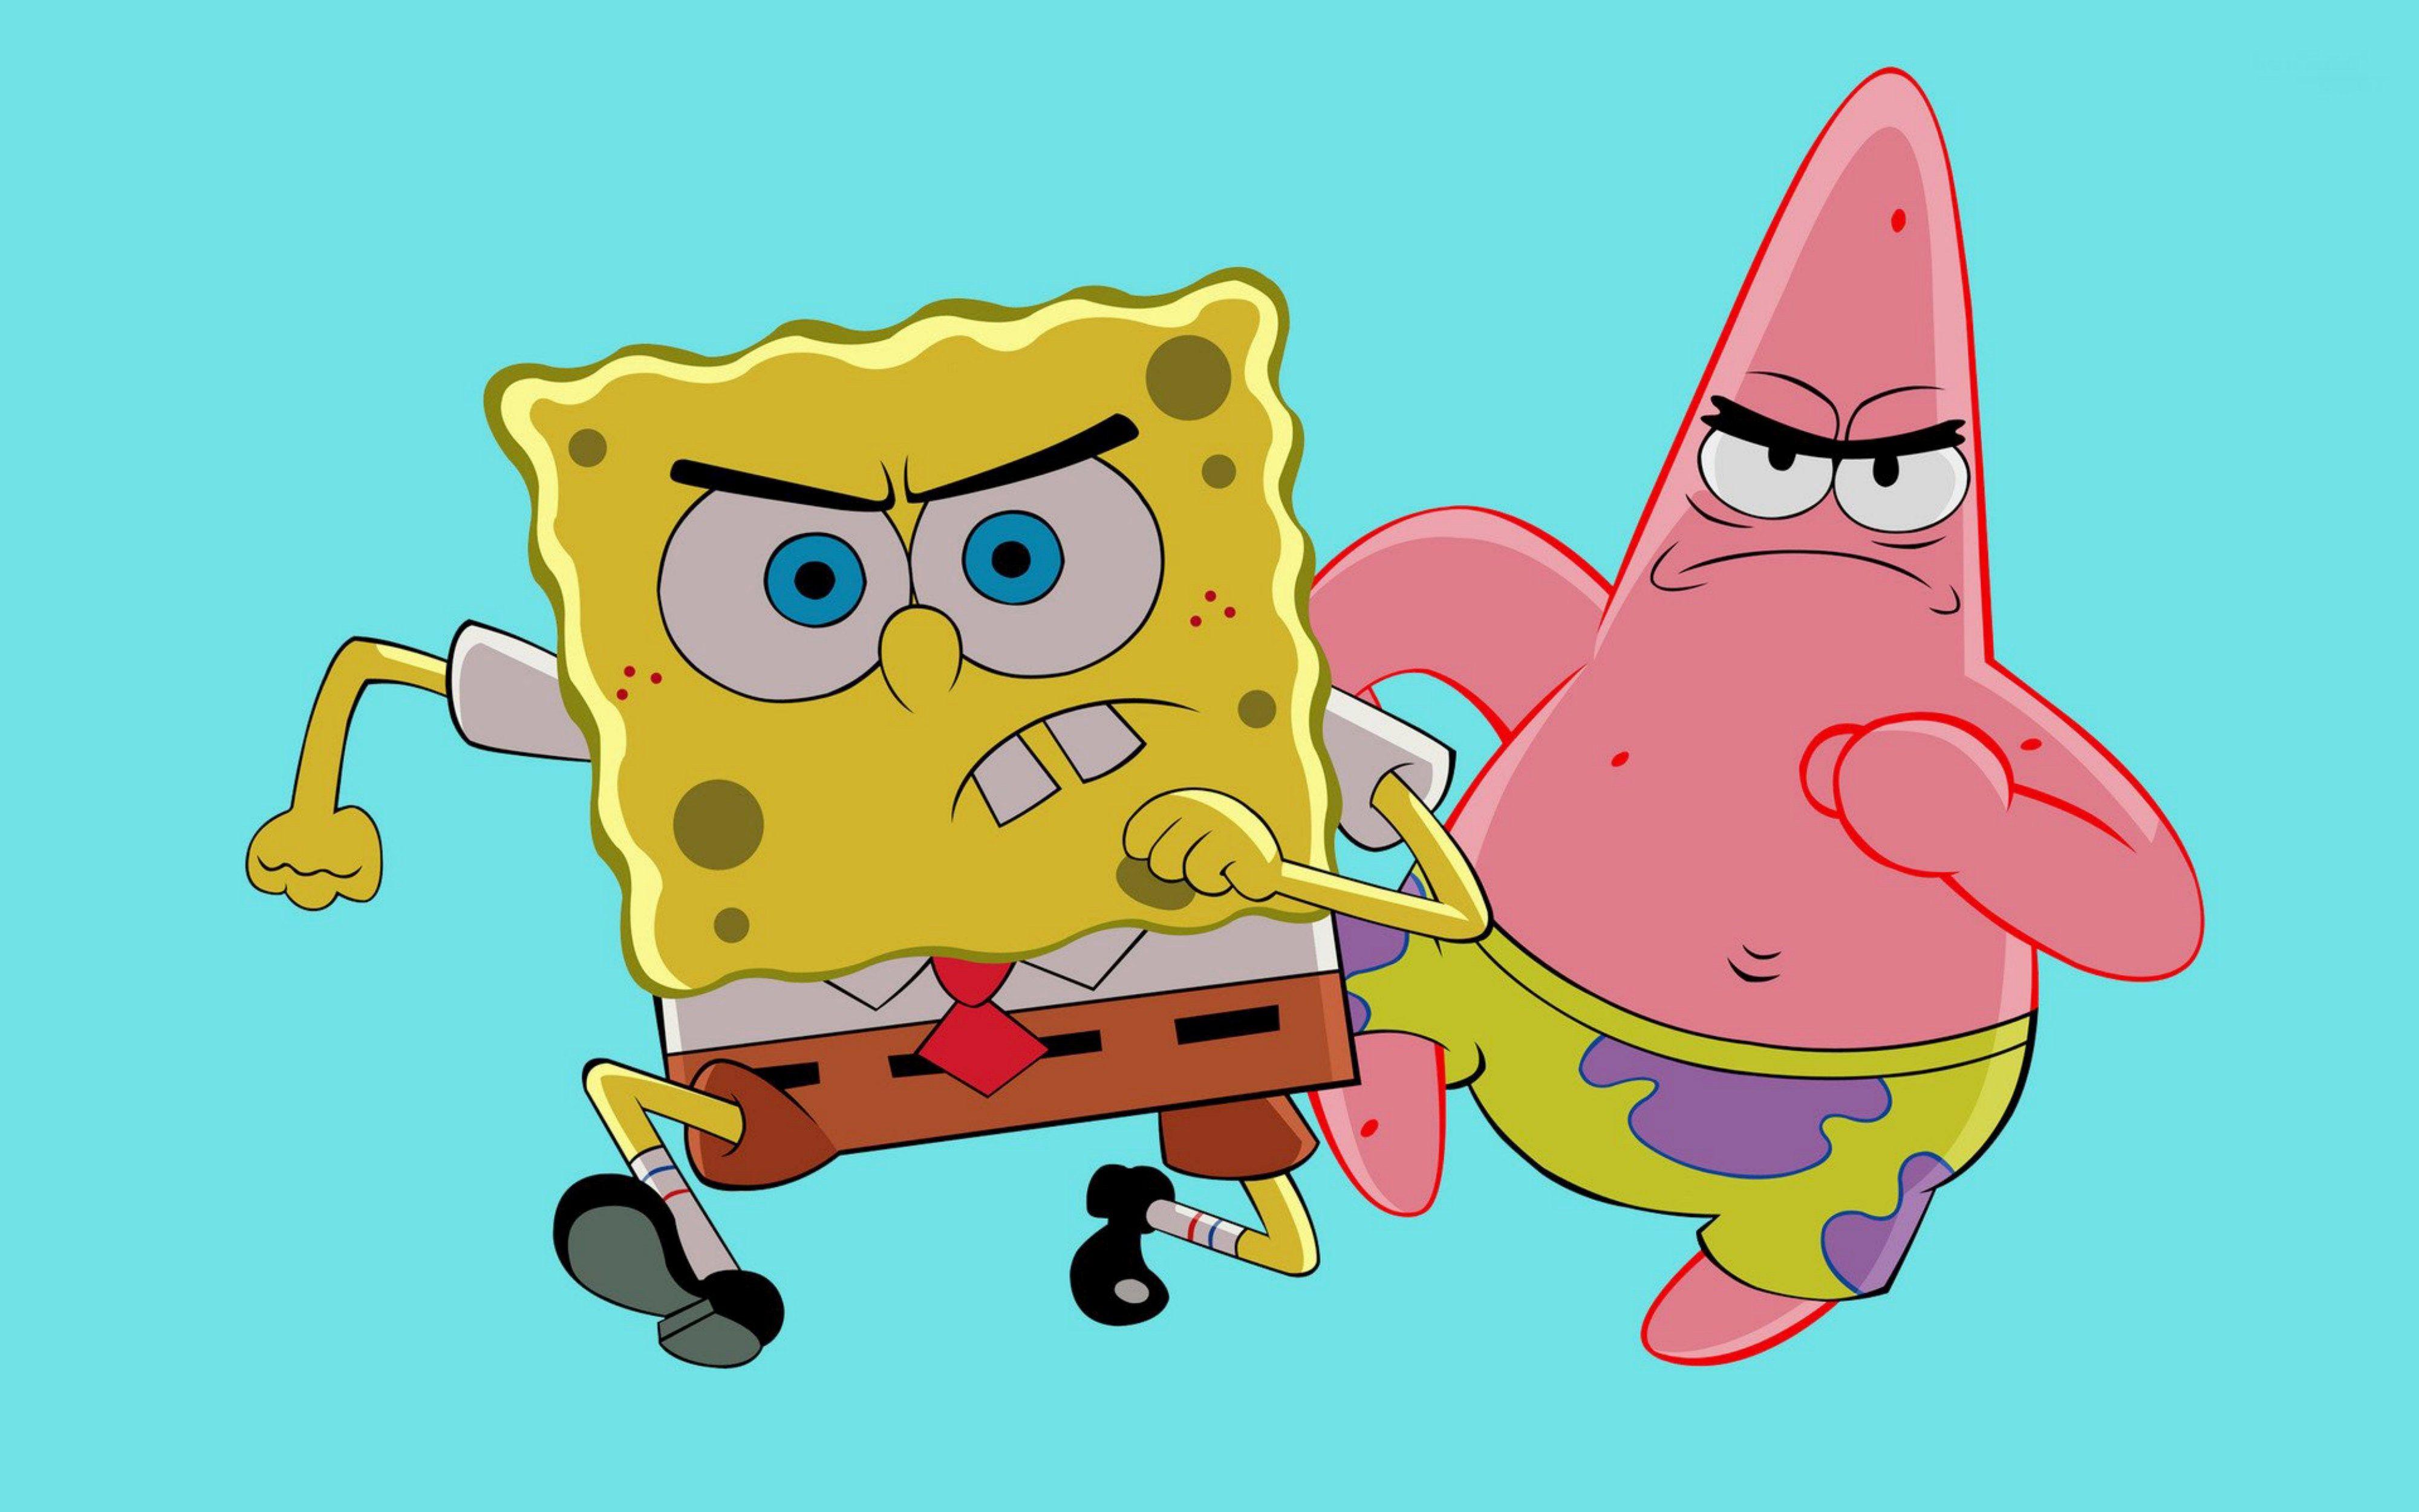 spongebob meme couples